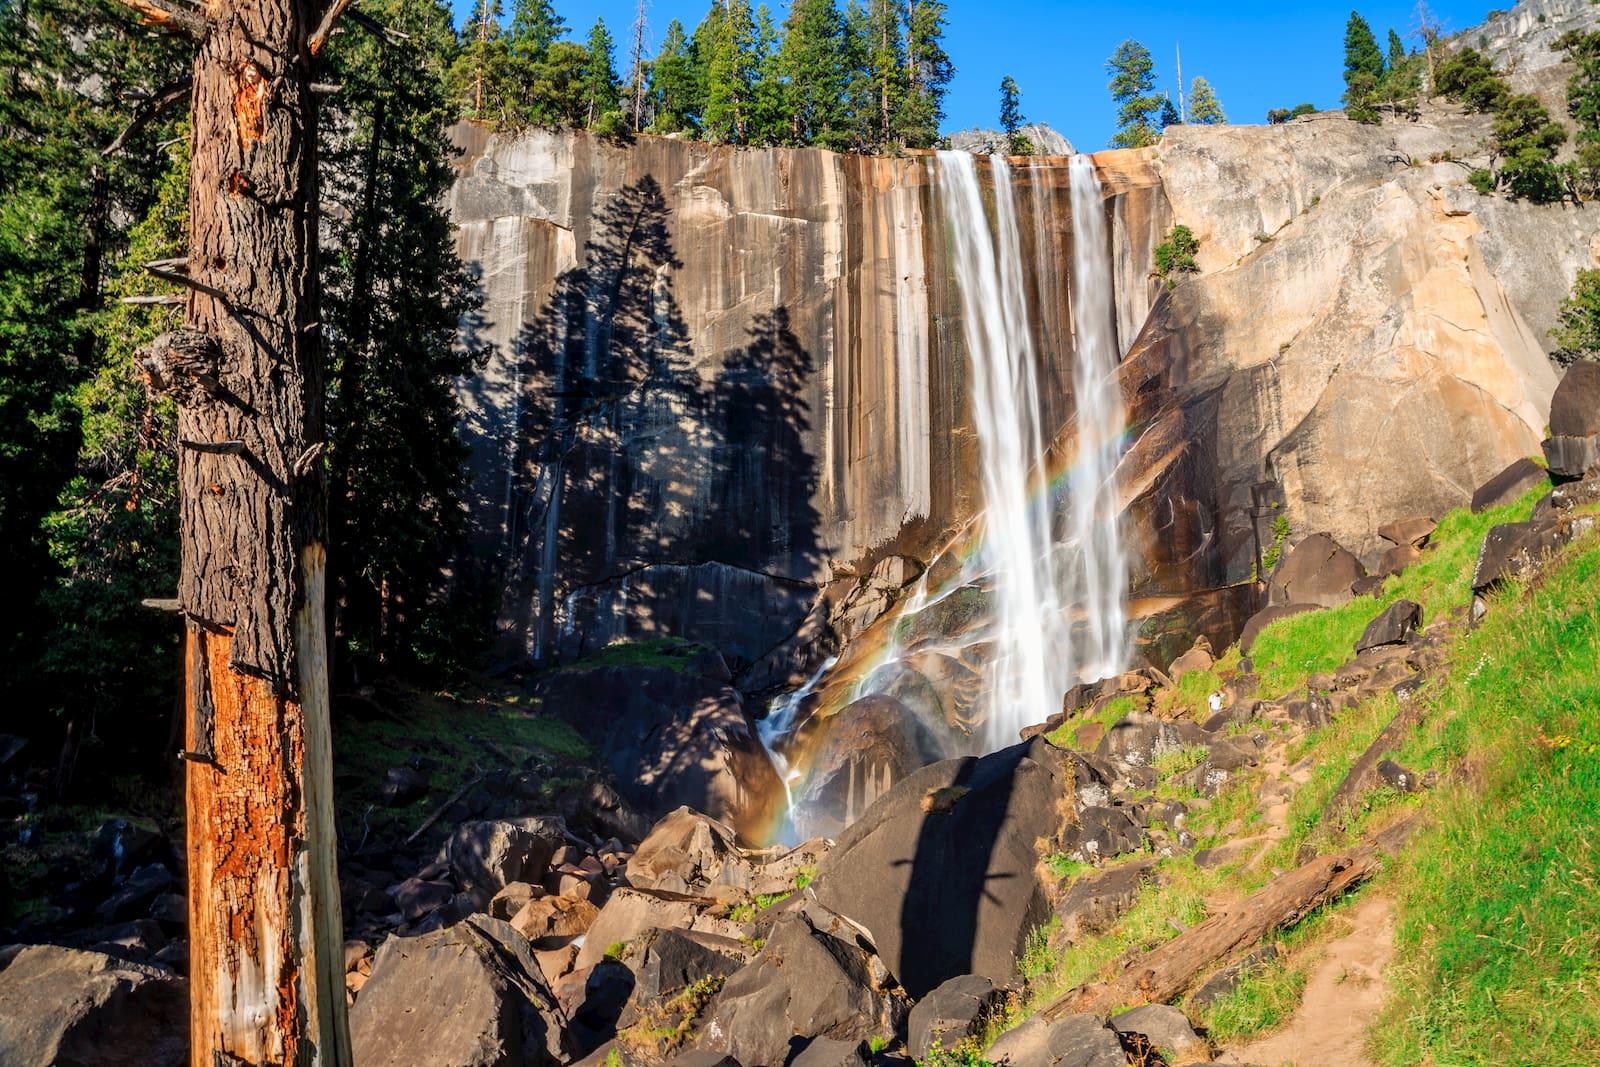 rainbow shimmering withing a waterfall crashing onto rocks below.